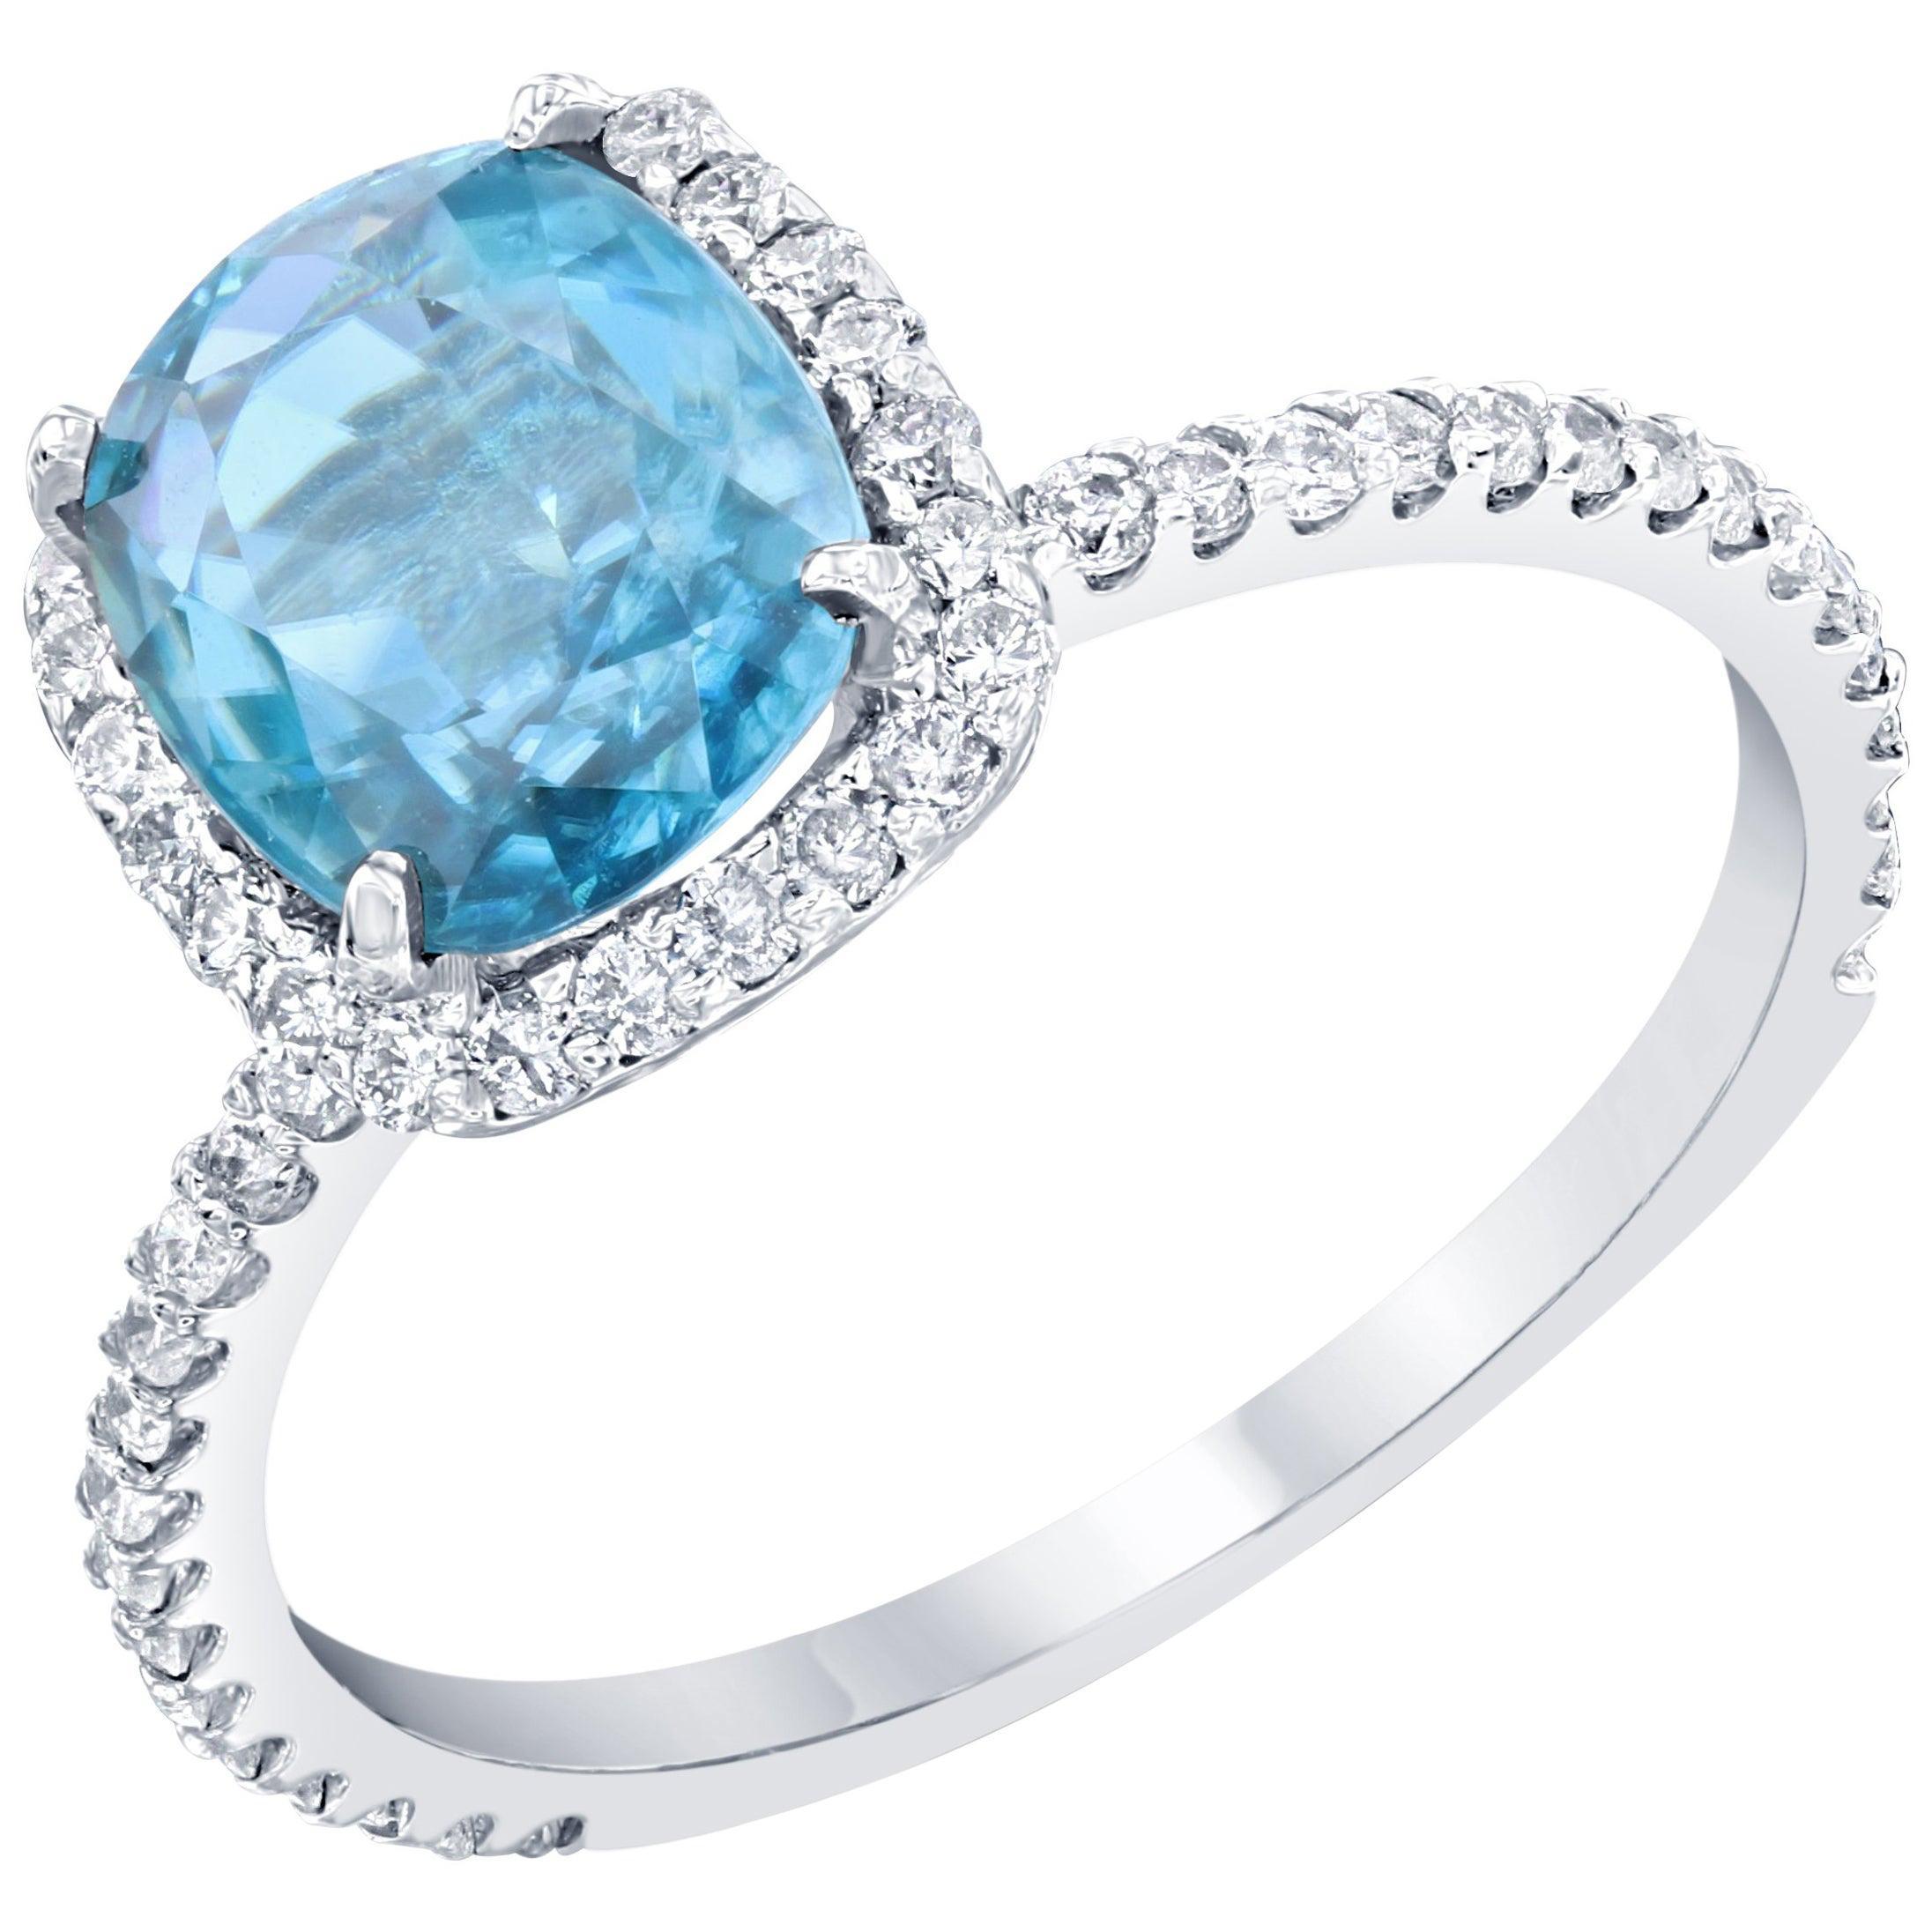 4.01 Carat Blue Zircon Diamond 14 Karat White Gold Bridal Ring